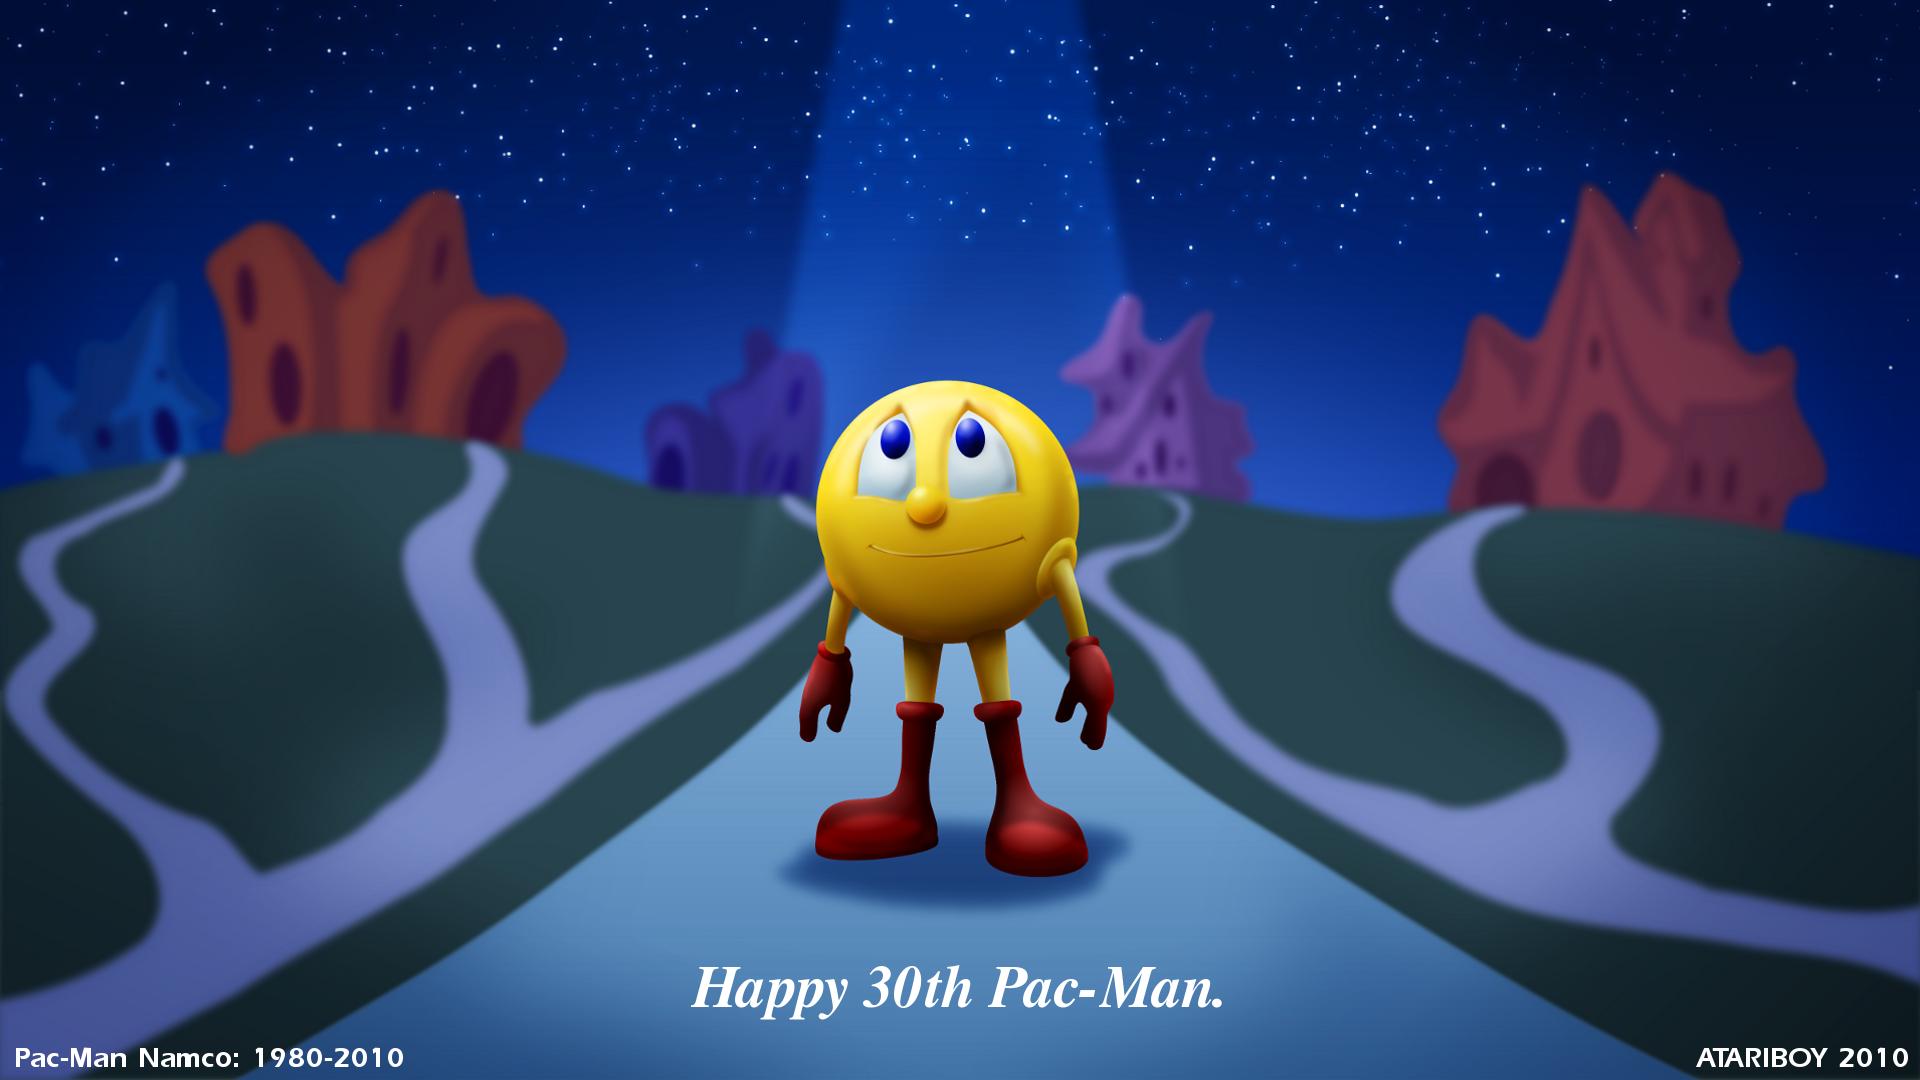 Pacman Deviantart 2019: Pac-Man Fan Art By Atariboy2600 On DeviantArt